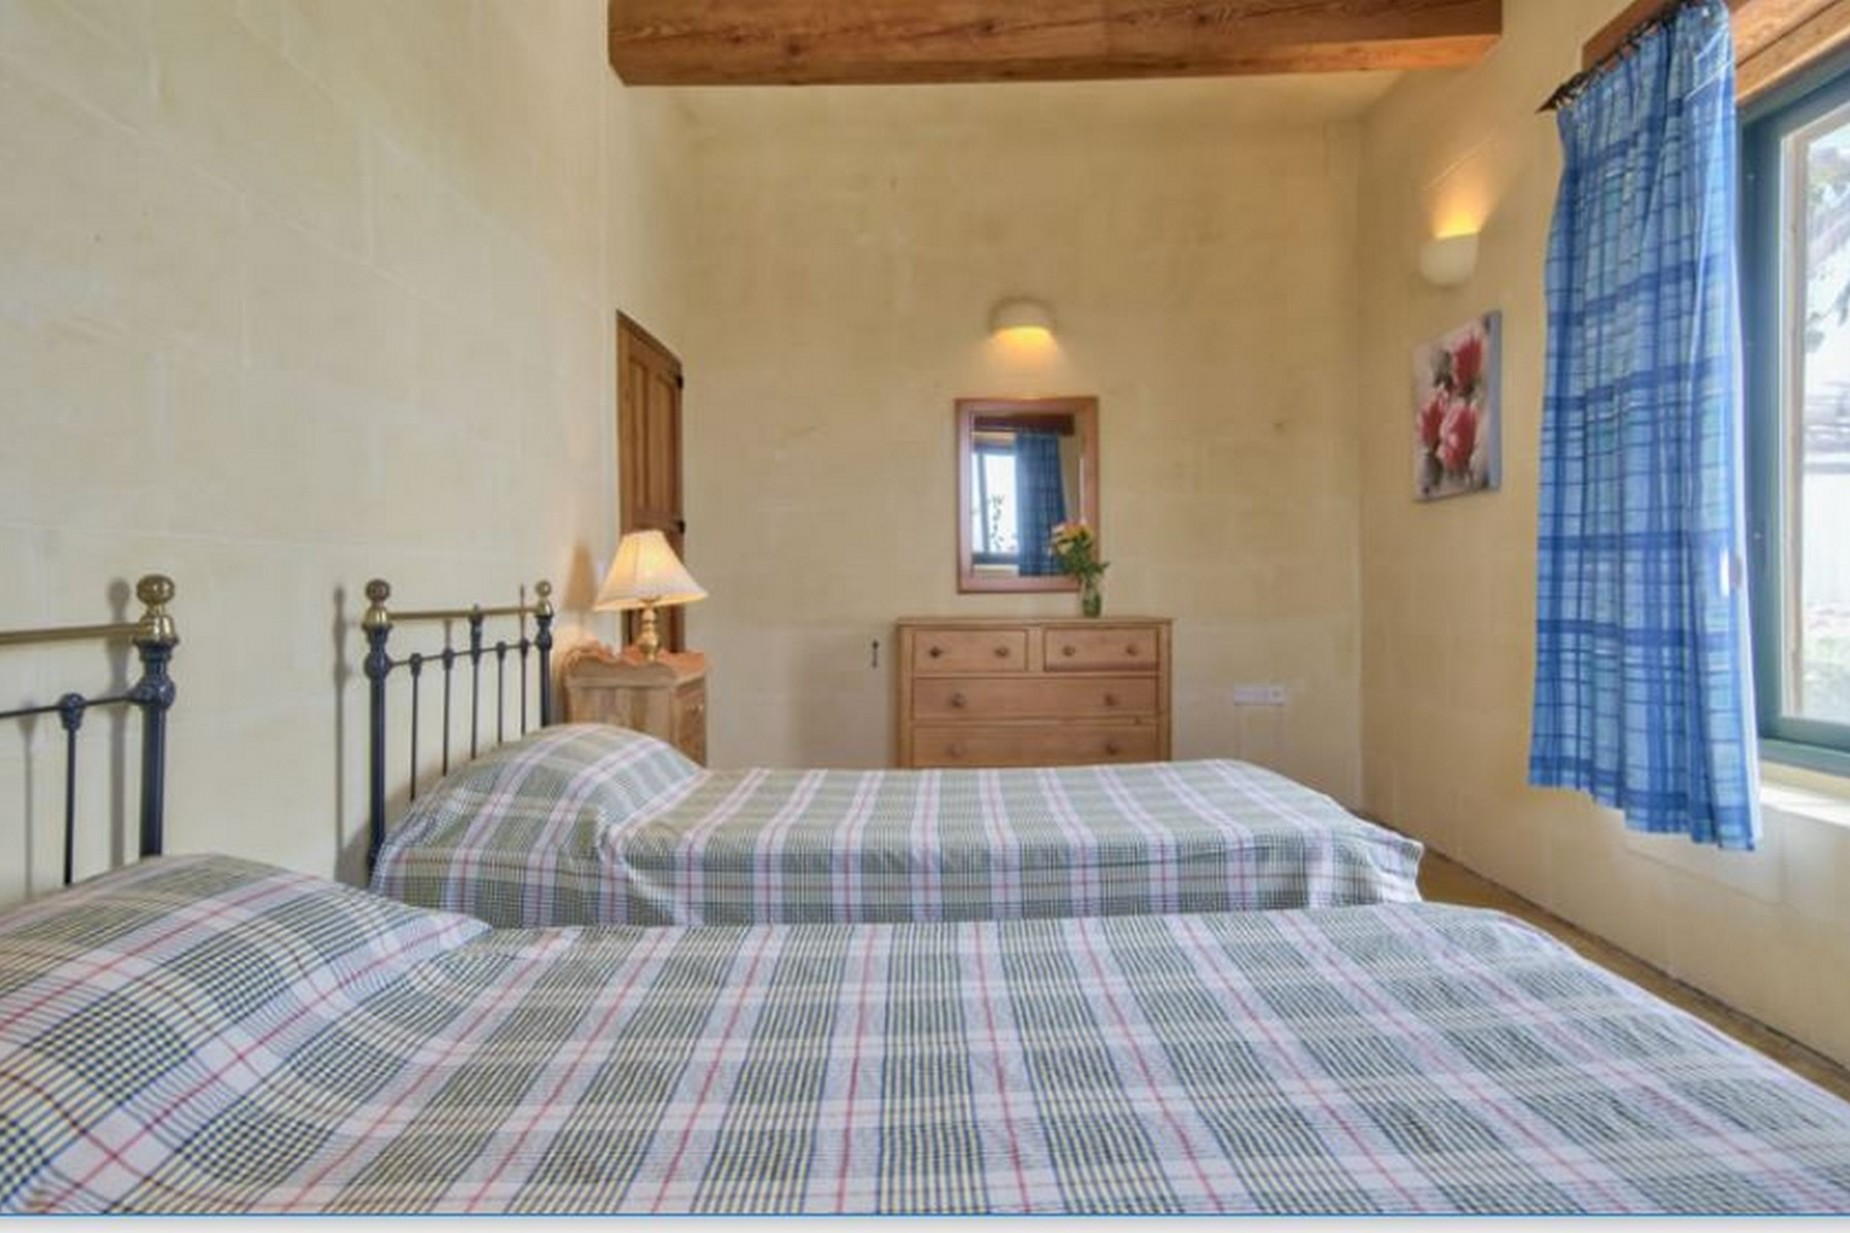 4 bed Farmhouse For Sale in Kercem, Kercem - thumb 11